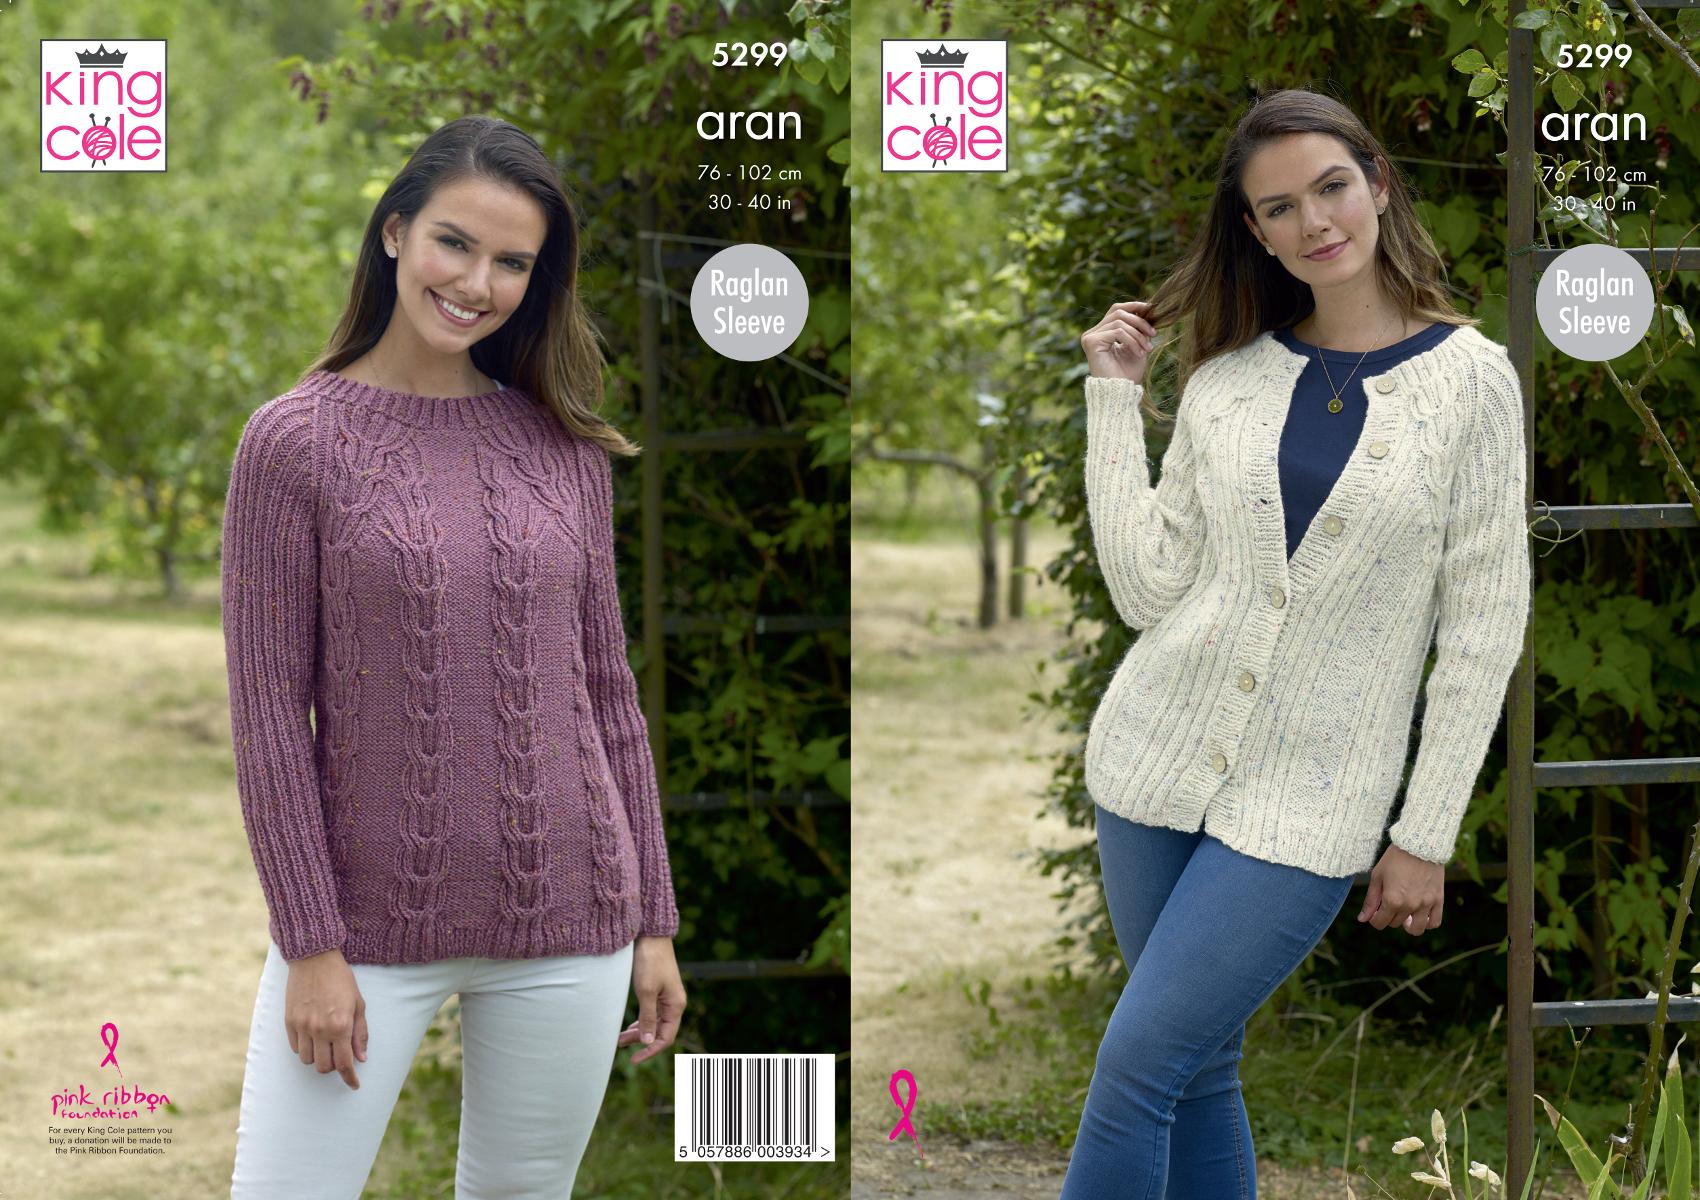 Girls Aran Knitting Pattern Cabled Raglan Sleeve Jumper Cardigan King Cole 4920